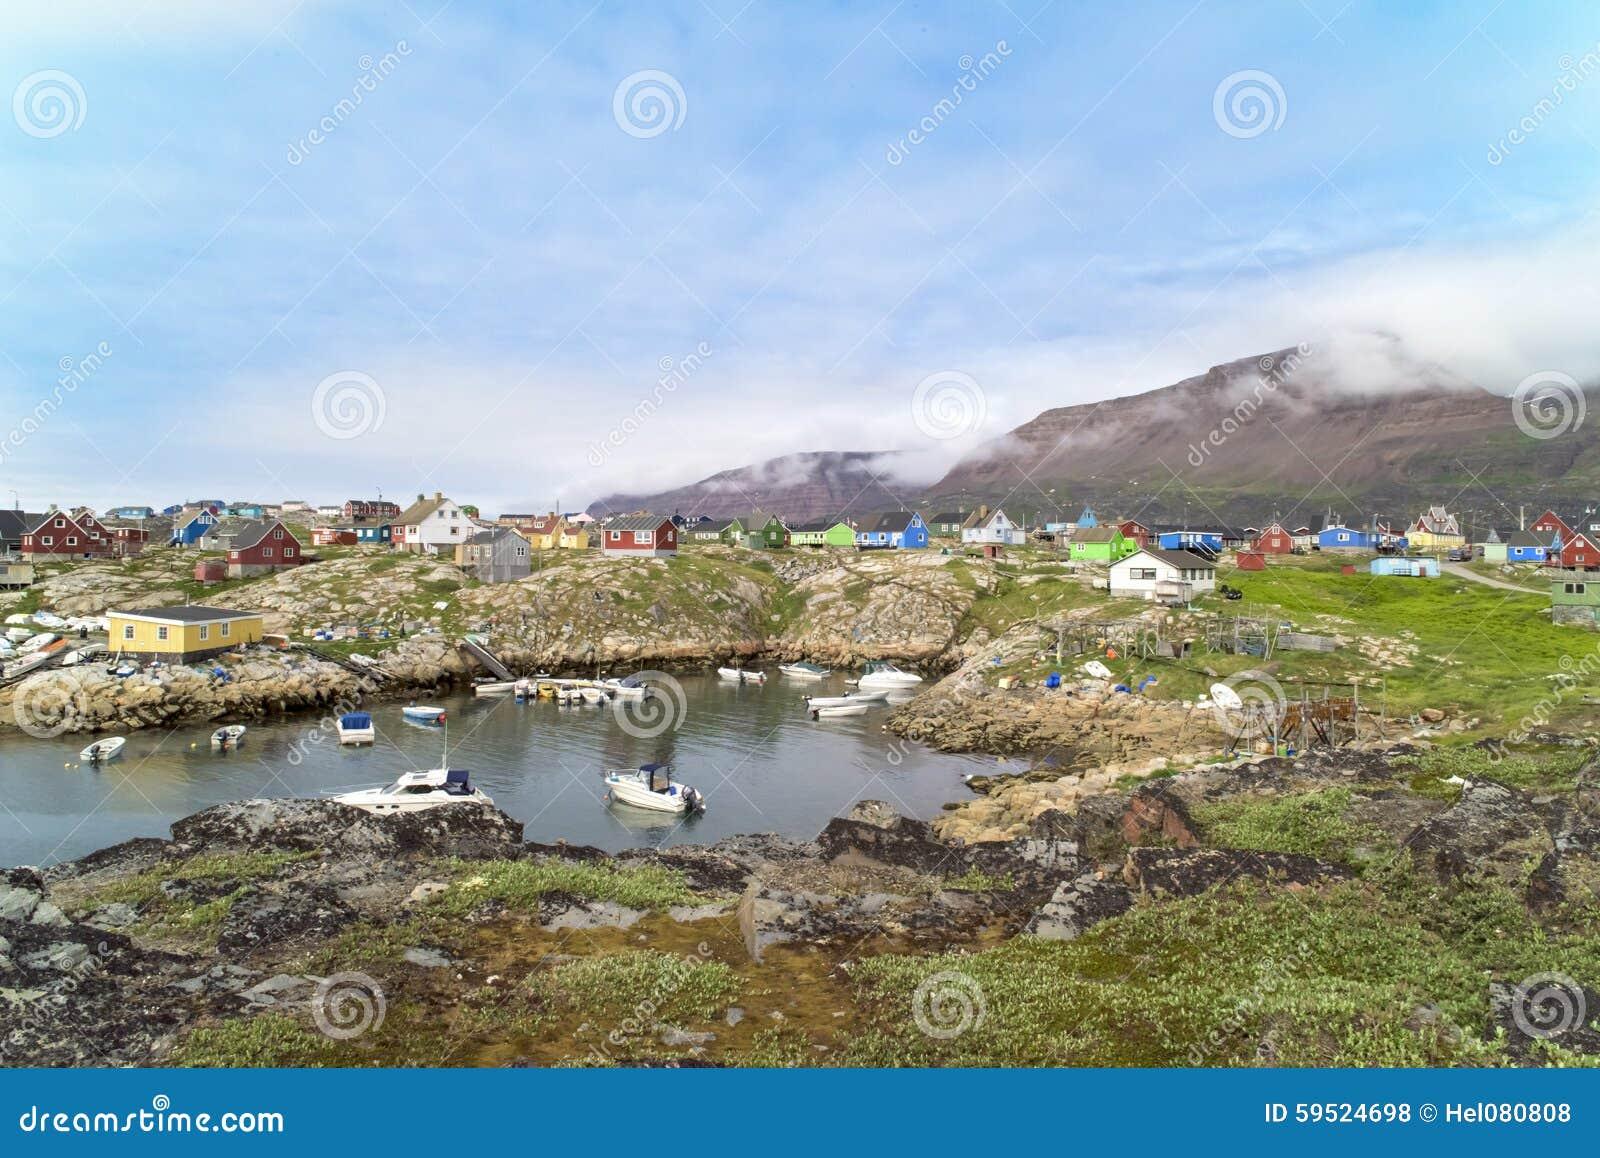 Casas coloridas Qeqertarsuaq, Gronelândia